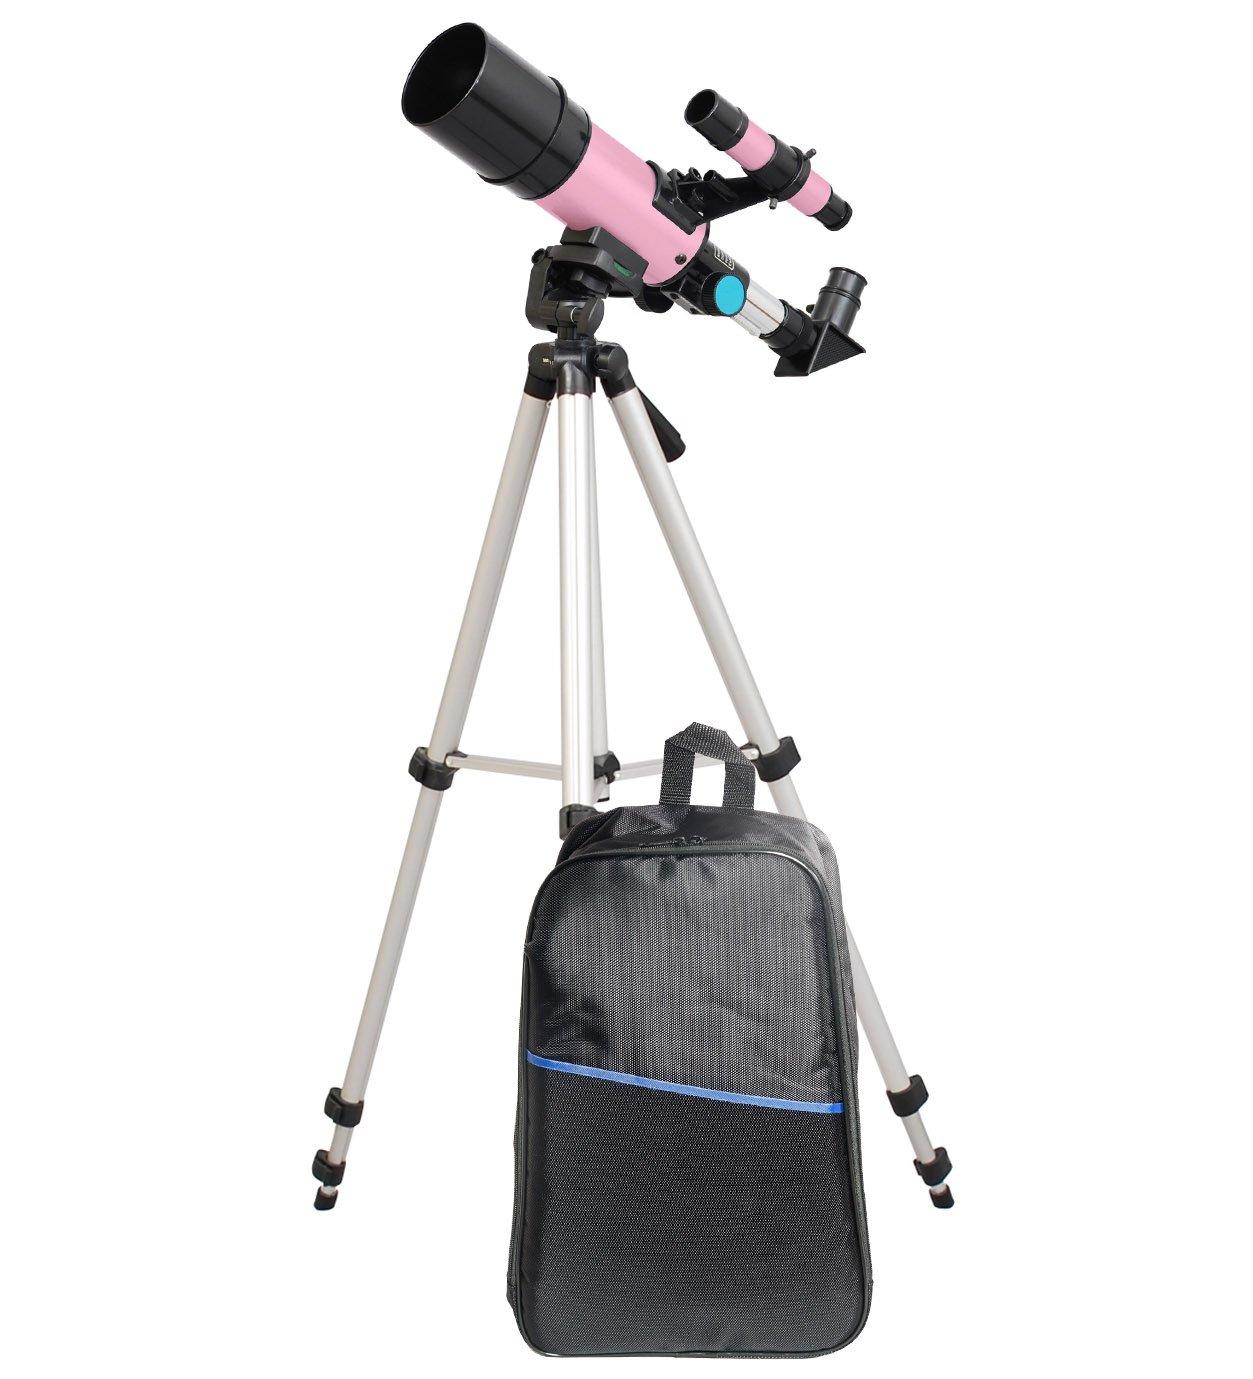 TwinStar 60mm Compact Refractor Telescope Backpack Bundle - Pink